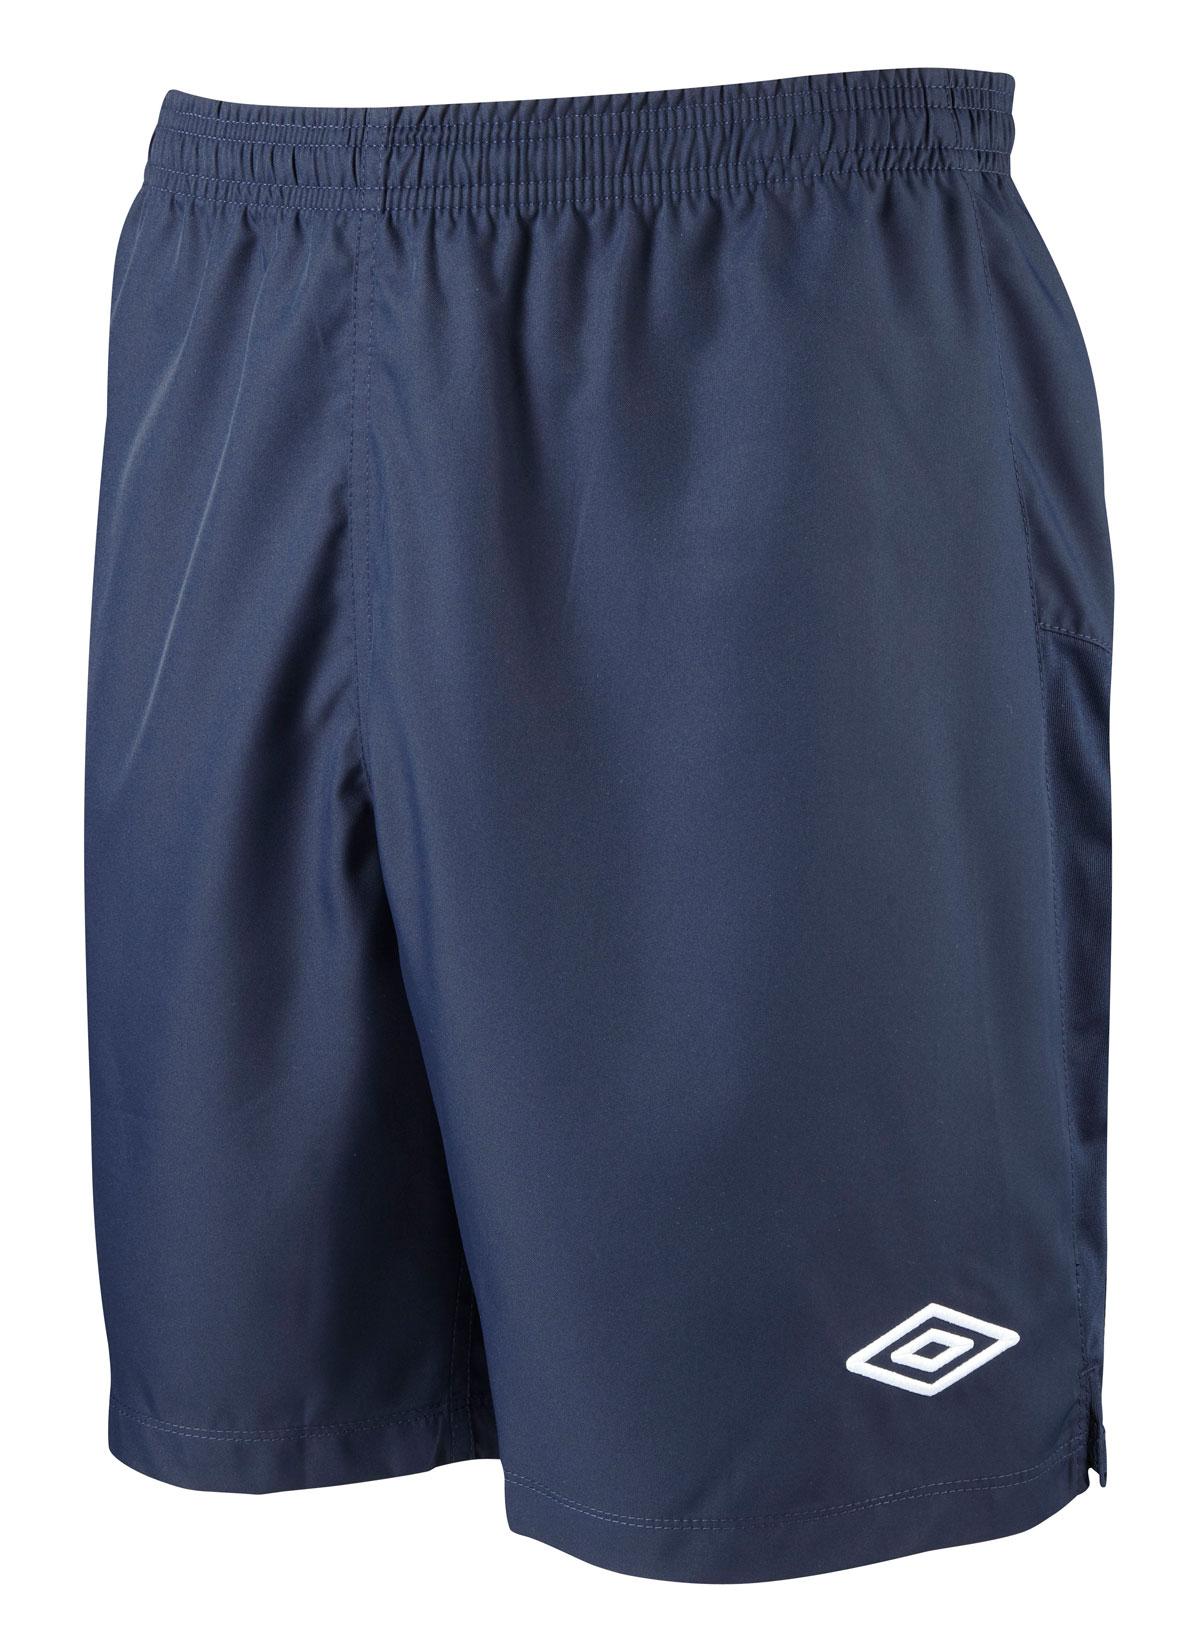 Umbro Sports Shorts for Children & Men's Shorts Football ...